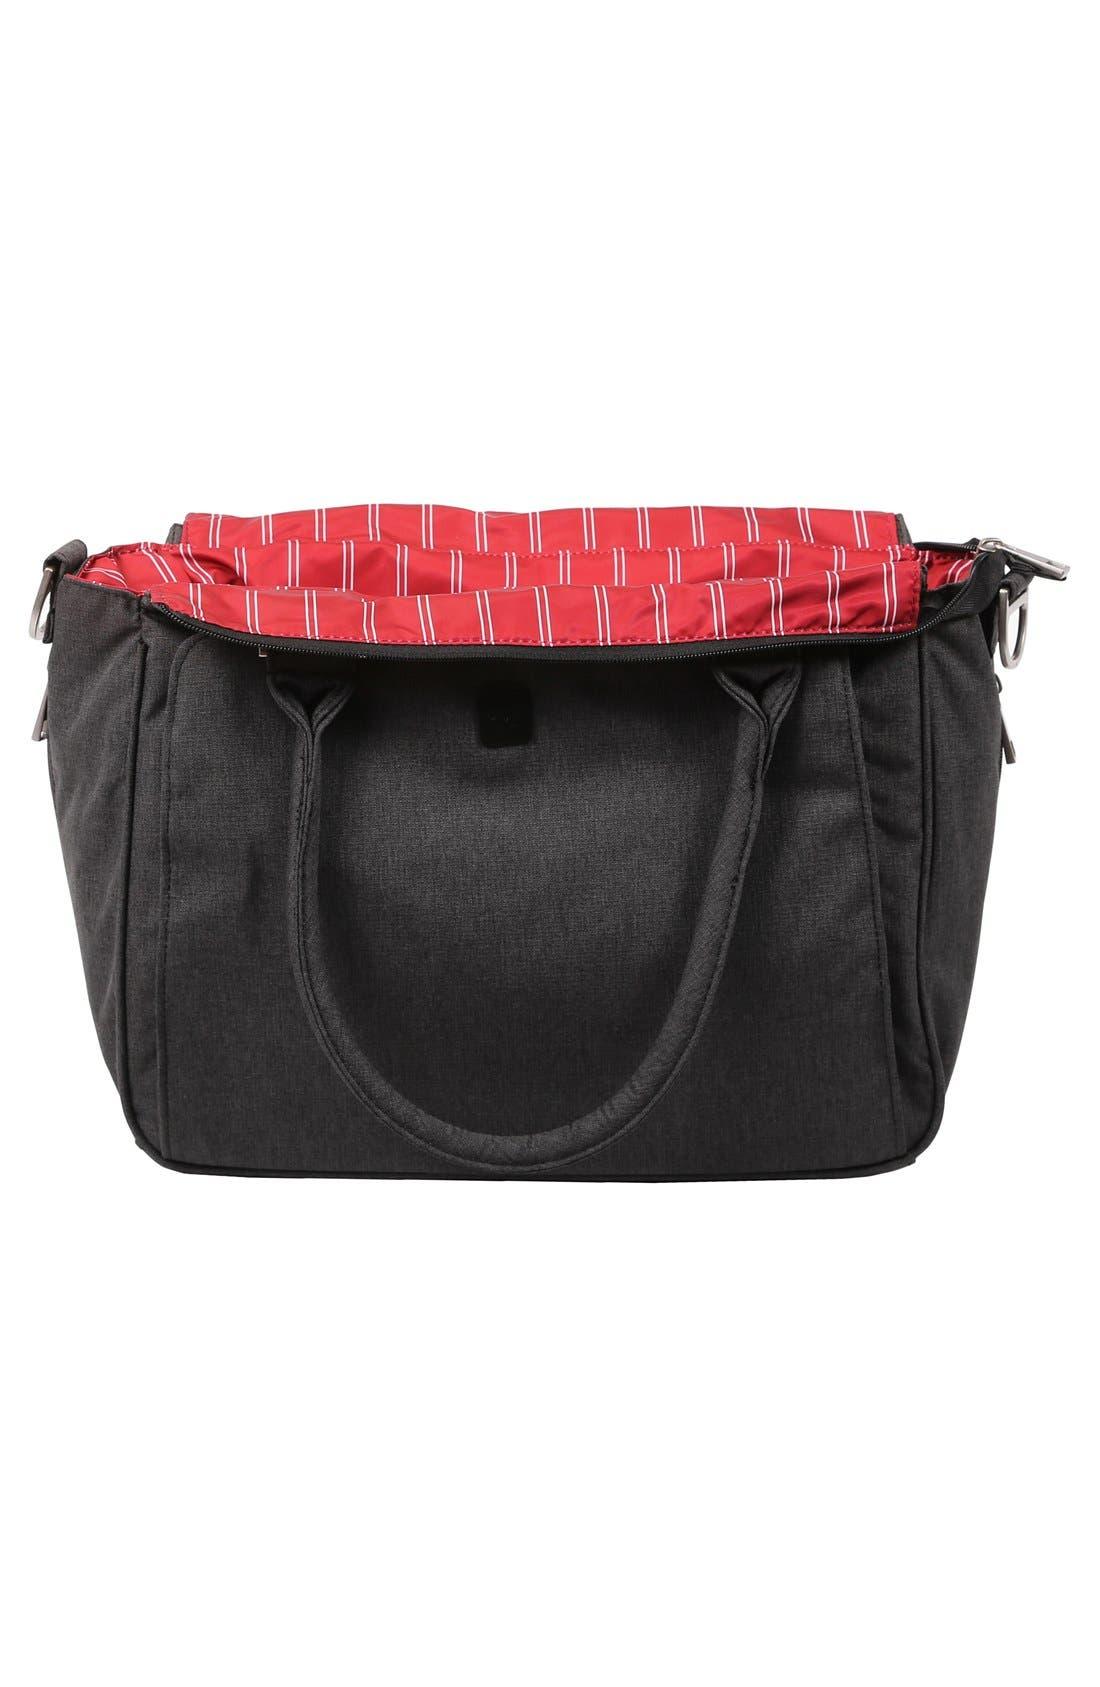 'Be Classy - Onyx Collection' Messenger Diaper Bag,                             Alternate thumbnail 6, color,                             Chrome